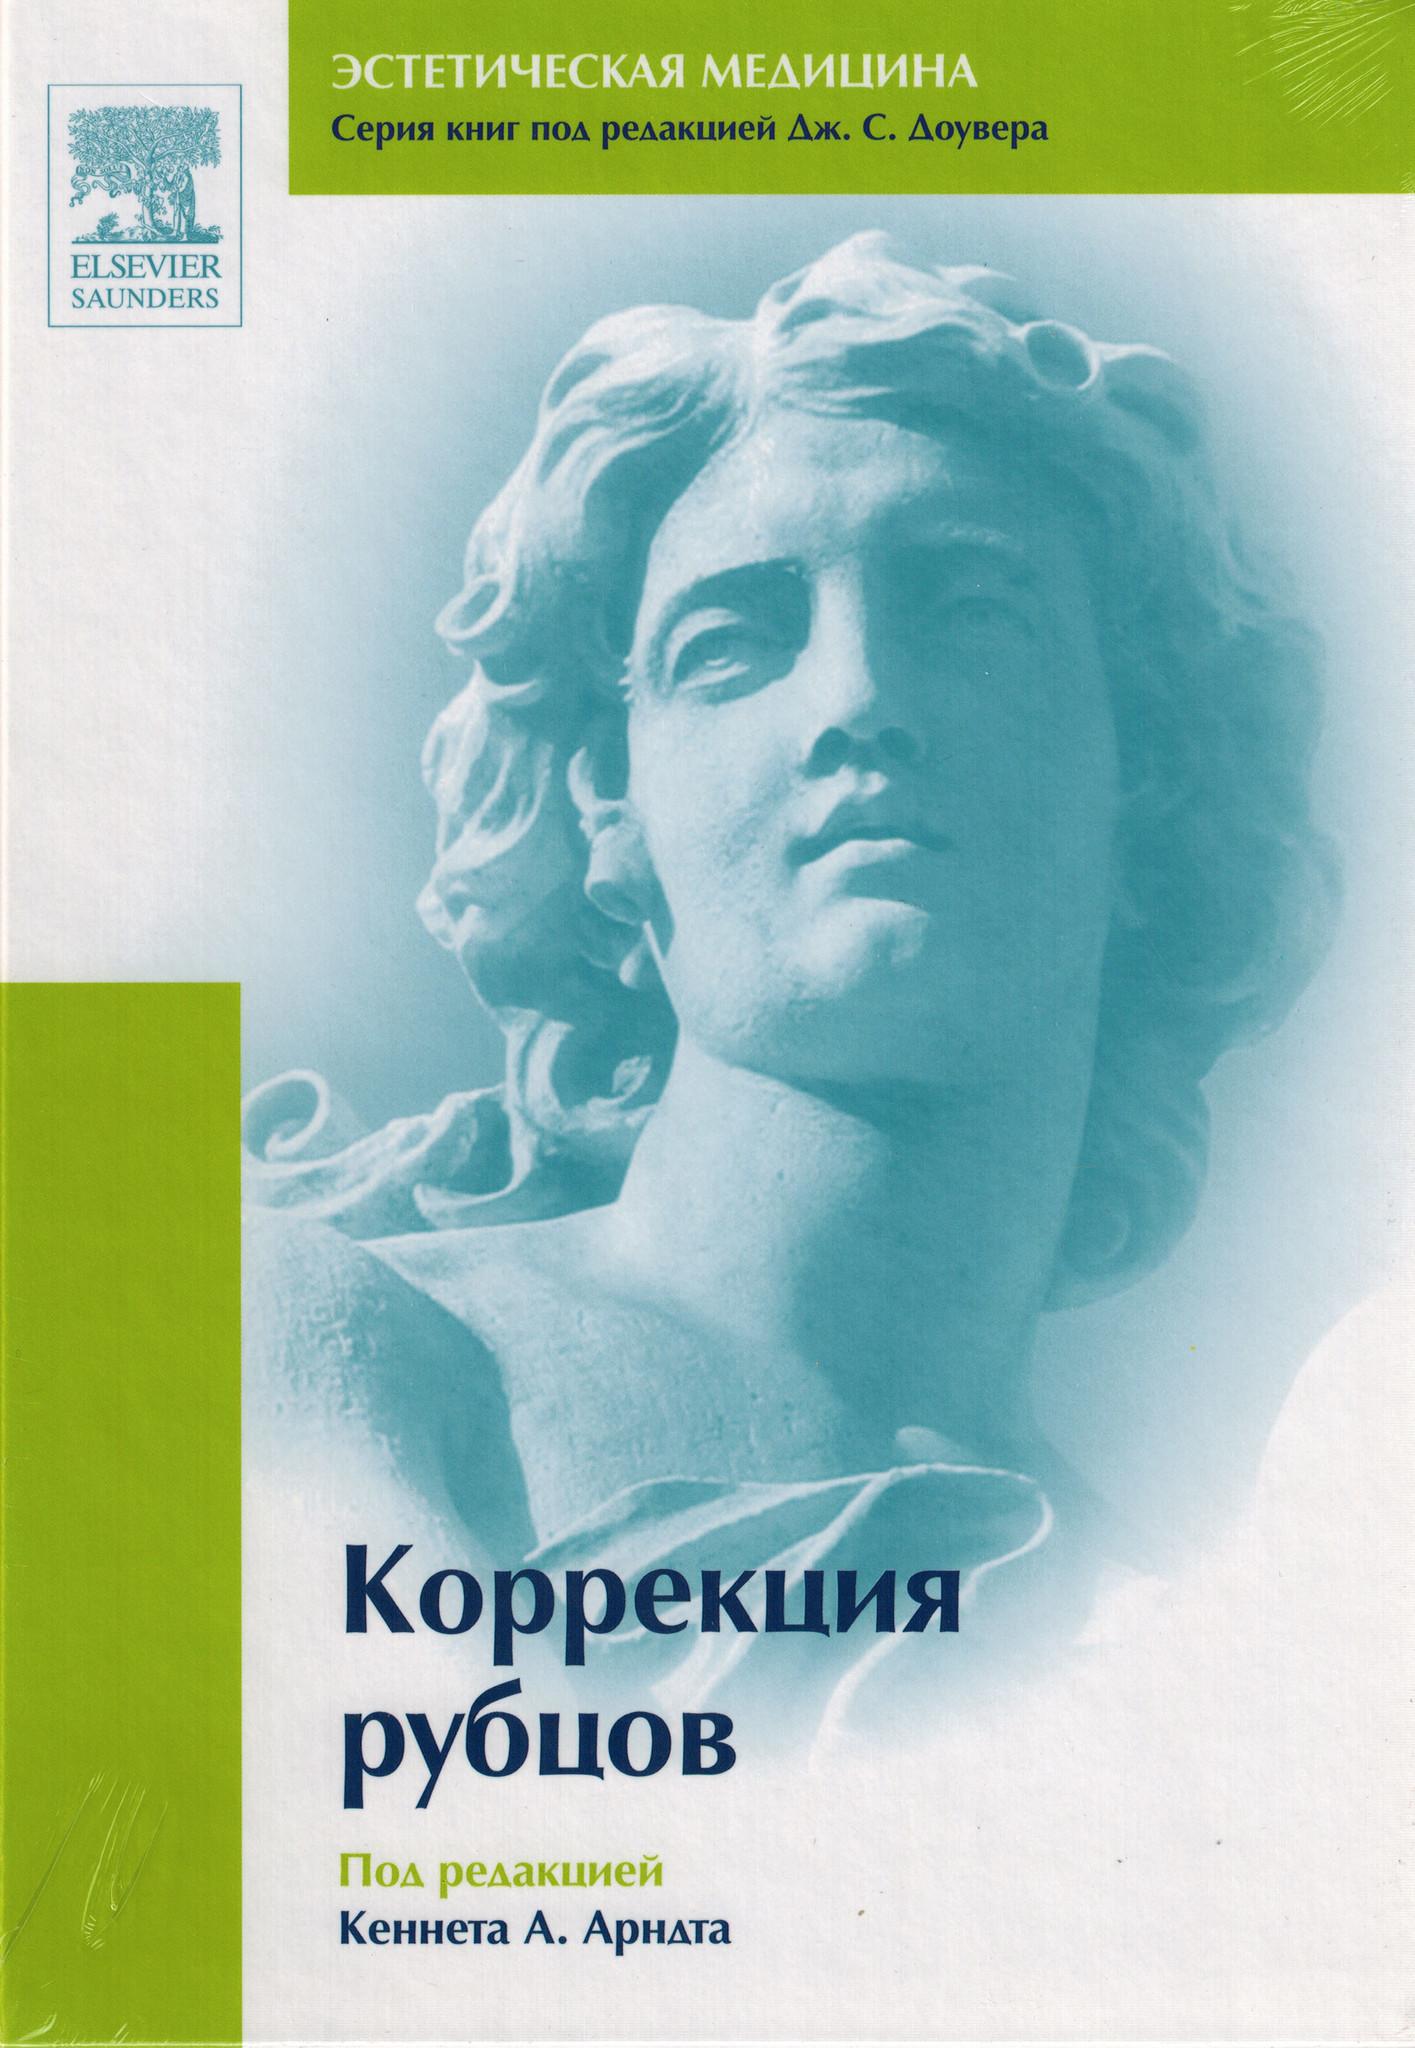 Пластика Коррекция рубцов kr_0001.jpg